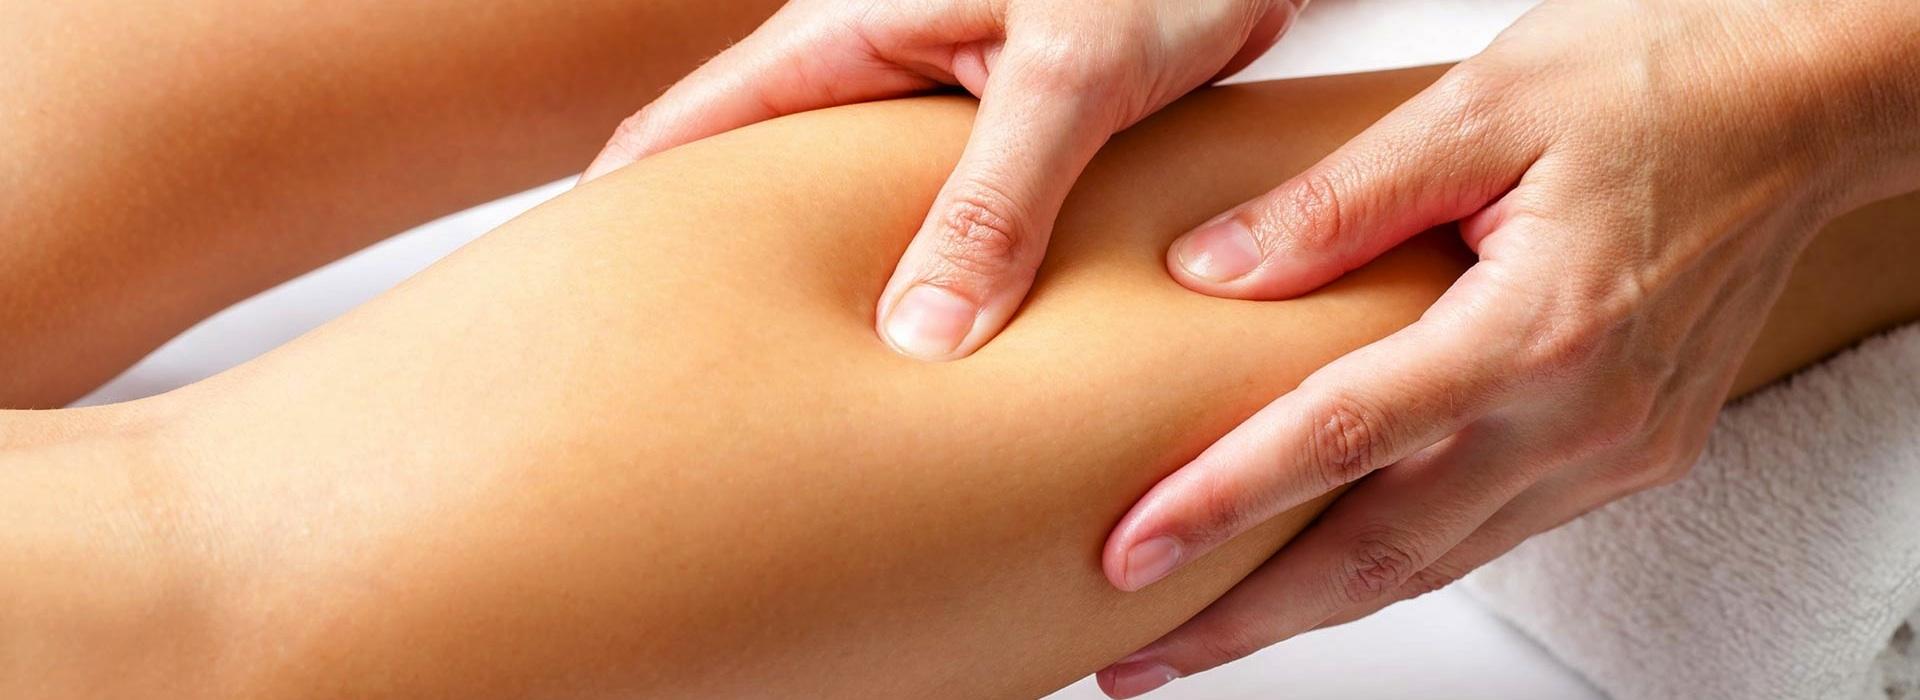 massage jambe - ecole de massage sensitif belge